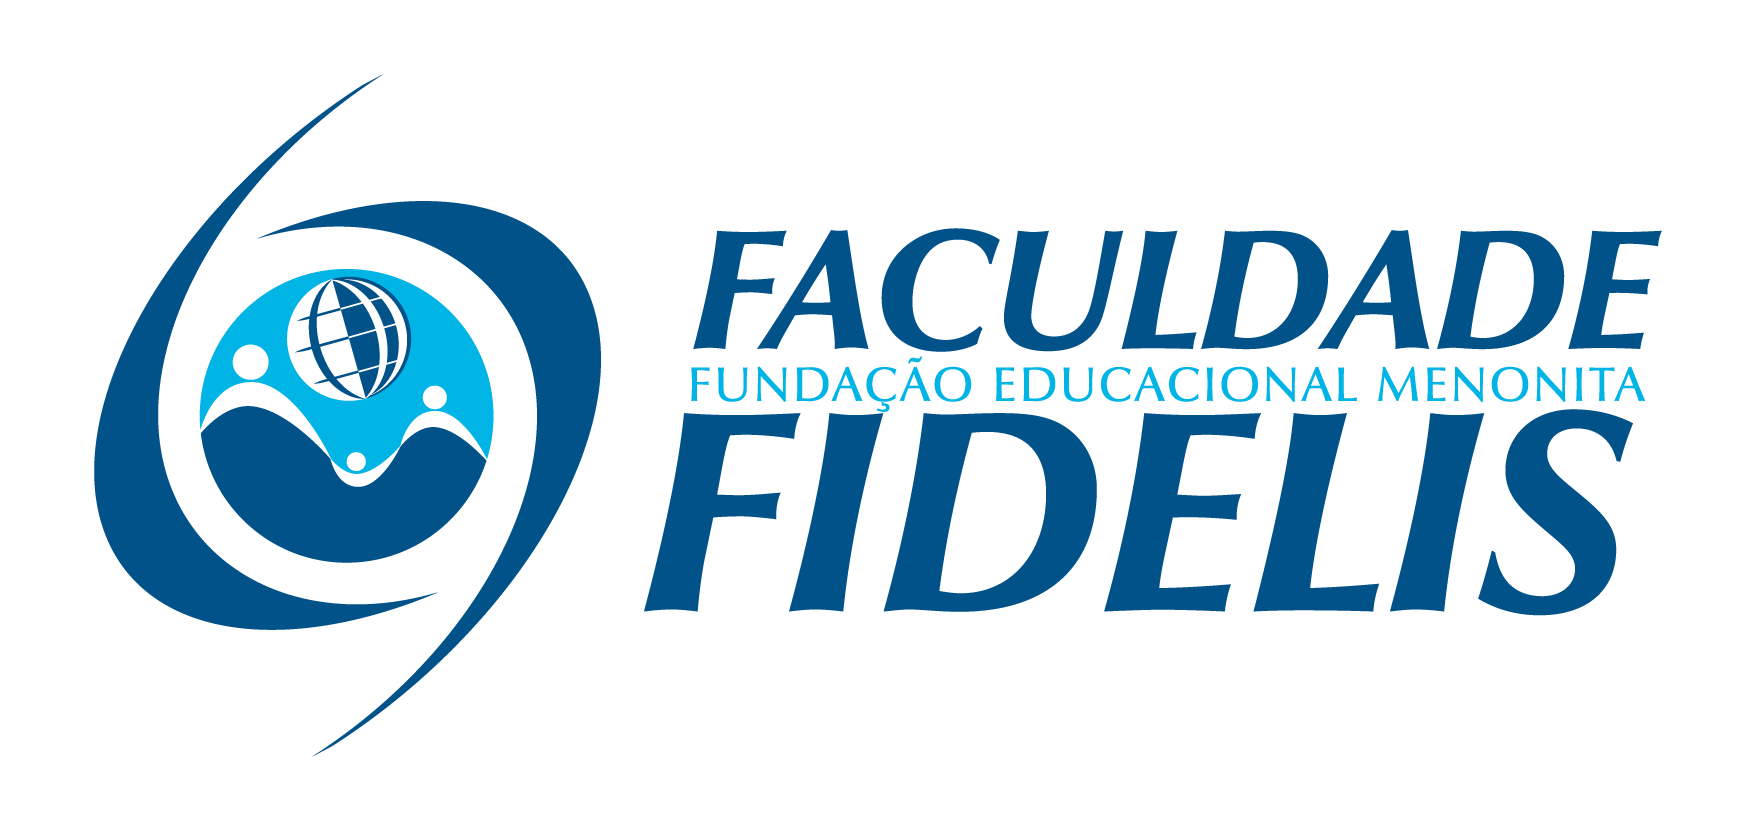 Faculdade Fidelis